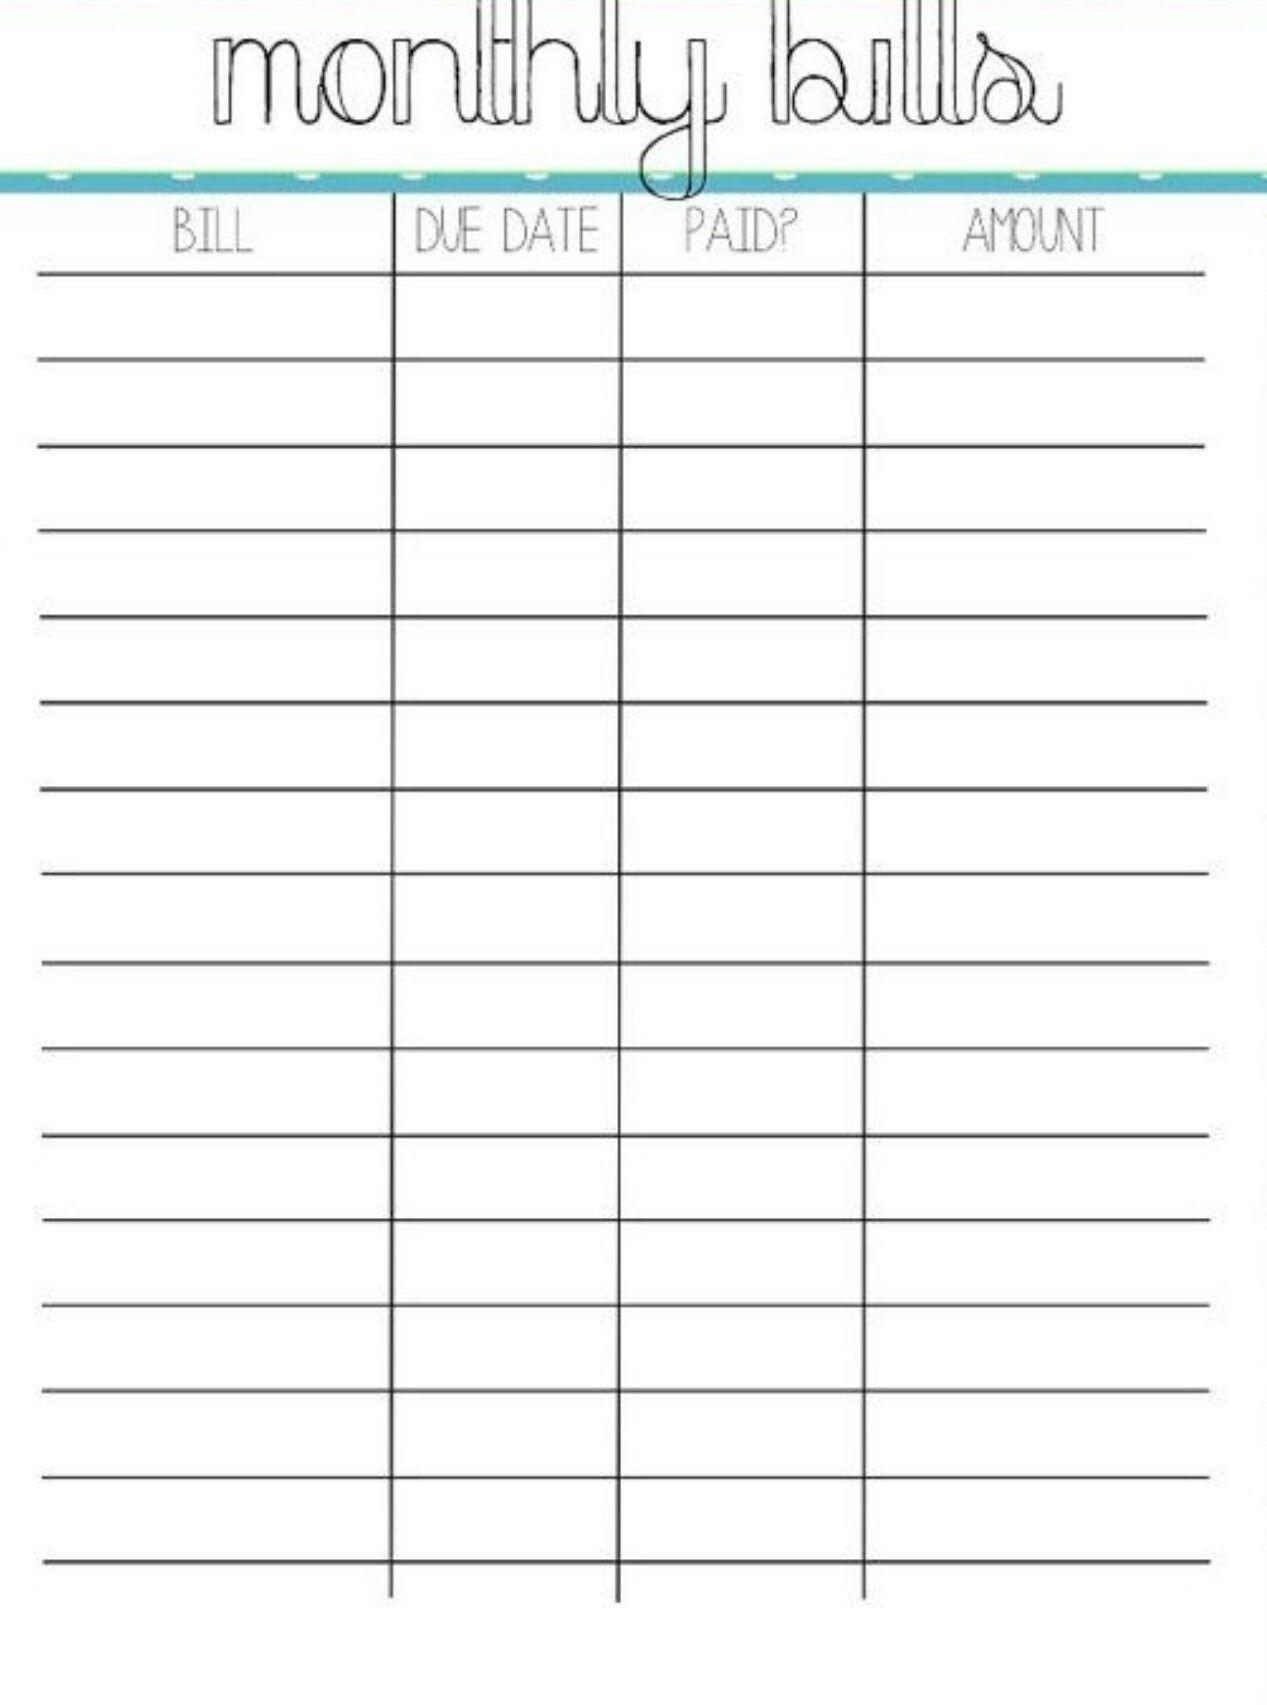 Spreadsheet Bills Budget Bill Payment Monthly Worksheet Pin  Printable Monthly Bills Sheet With Calendar